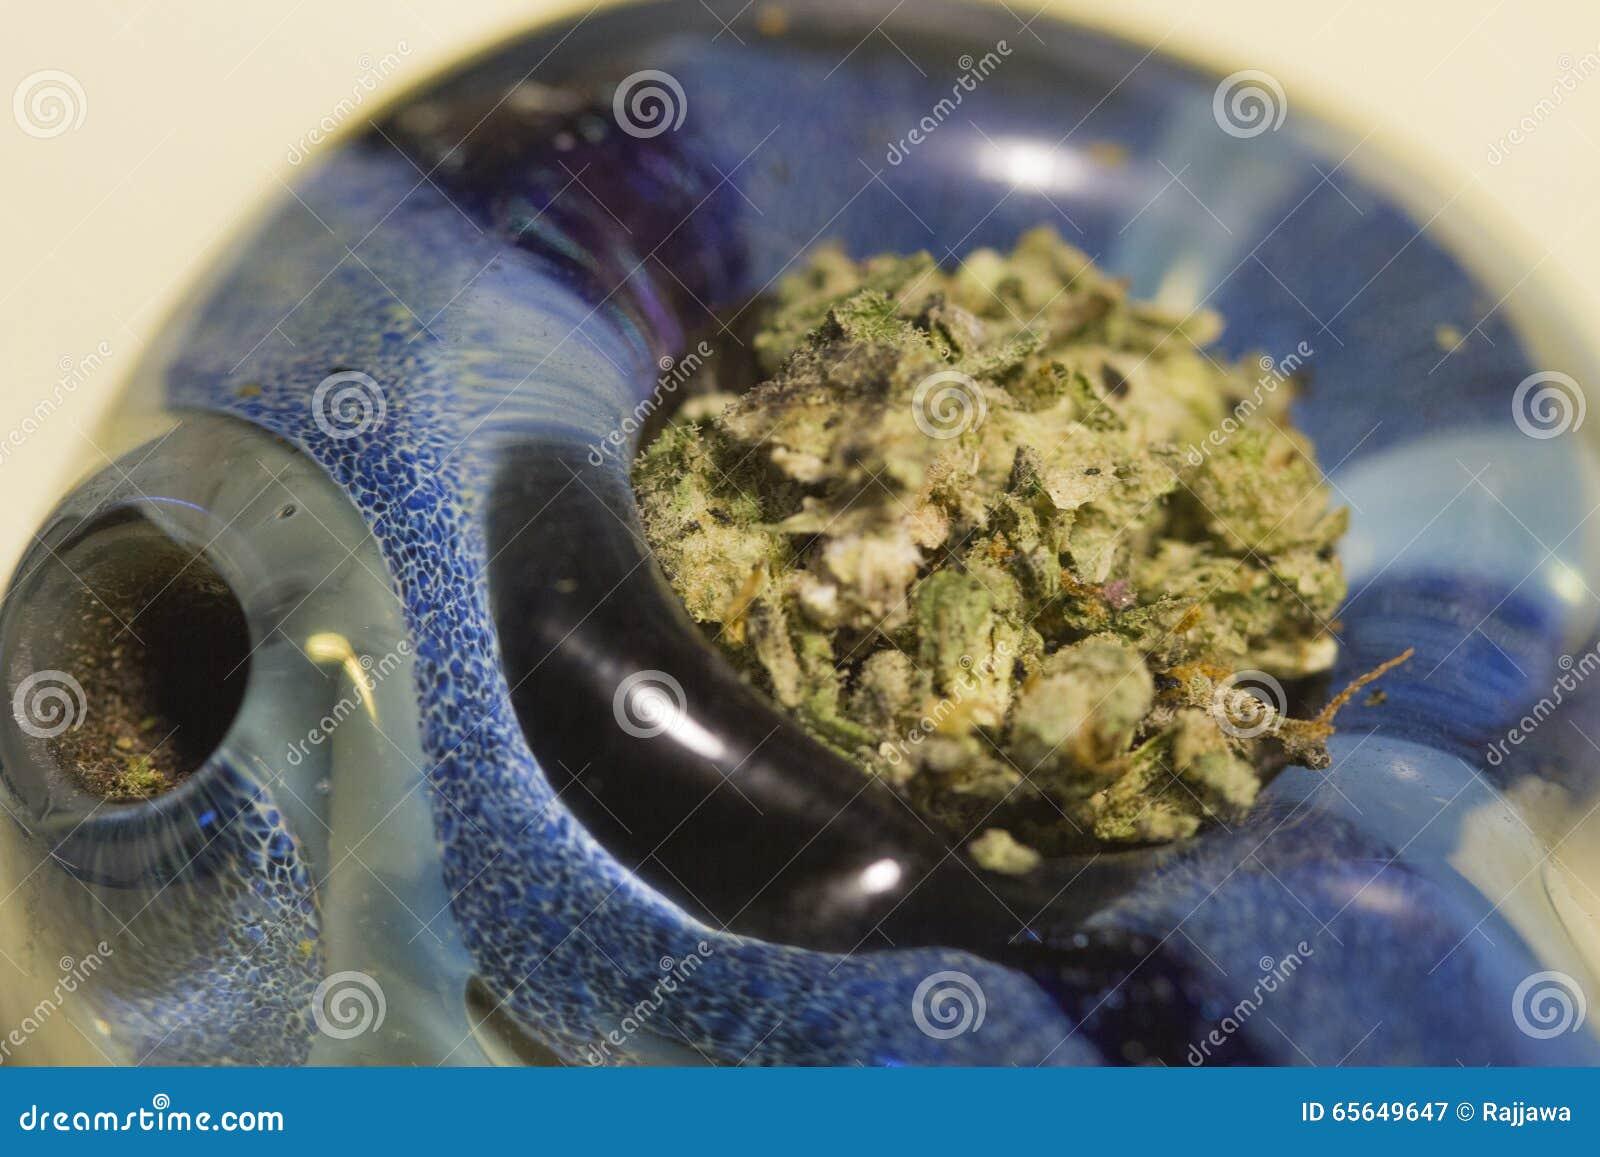 Cannabis dans le tuyau en verre - fin